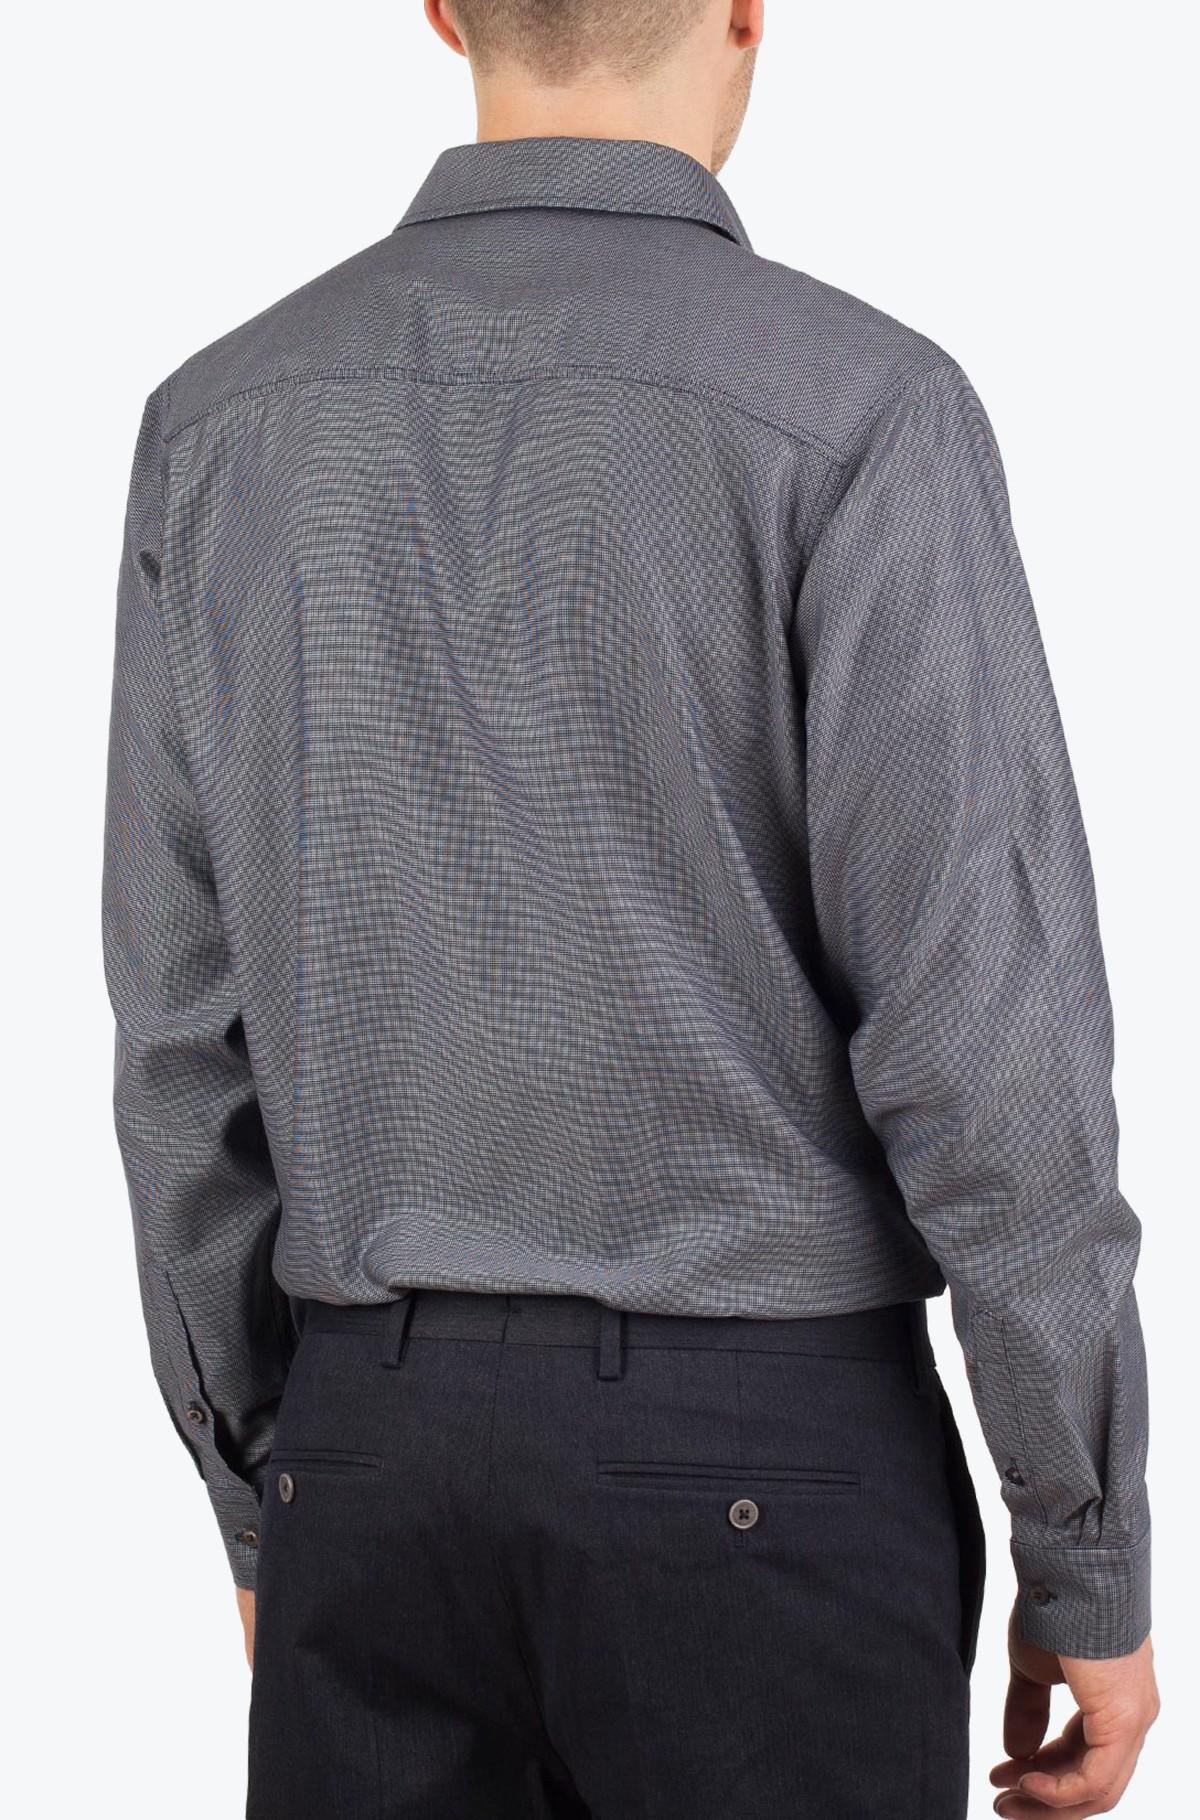 Marškiniai Sten-full-2